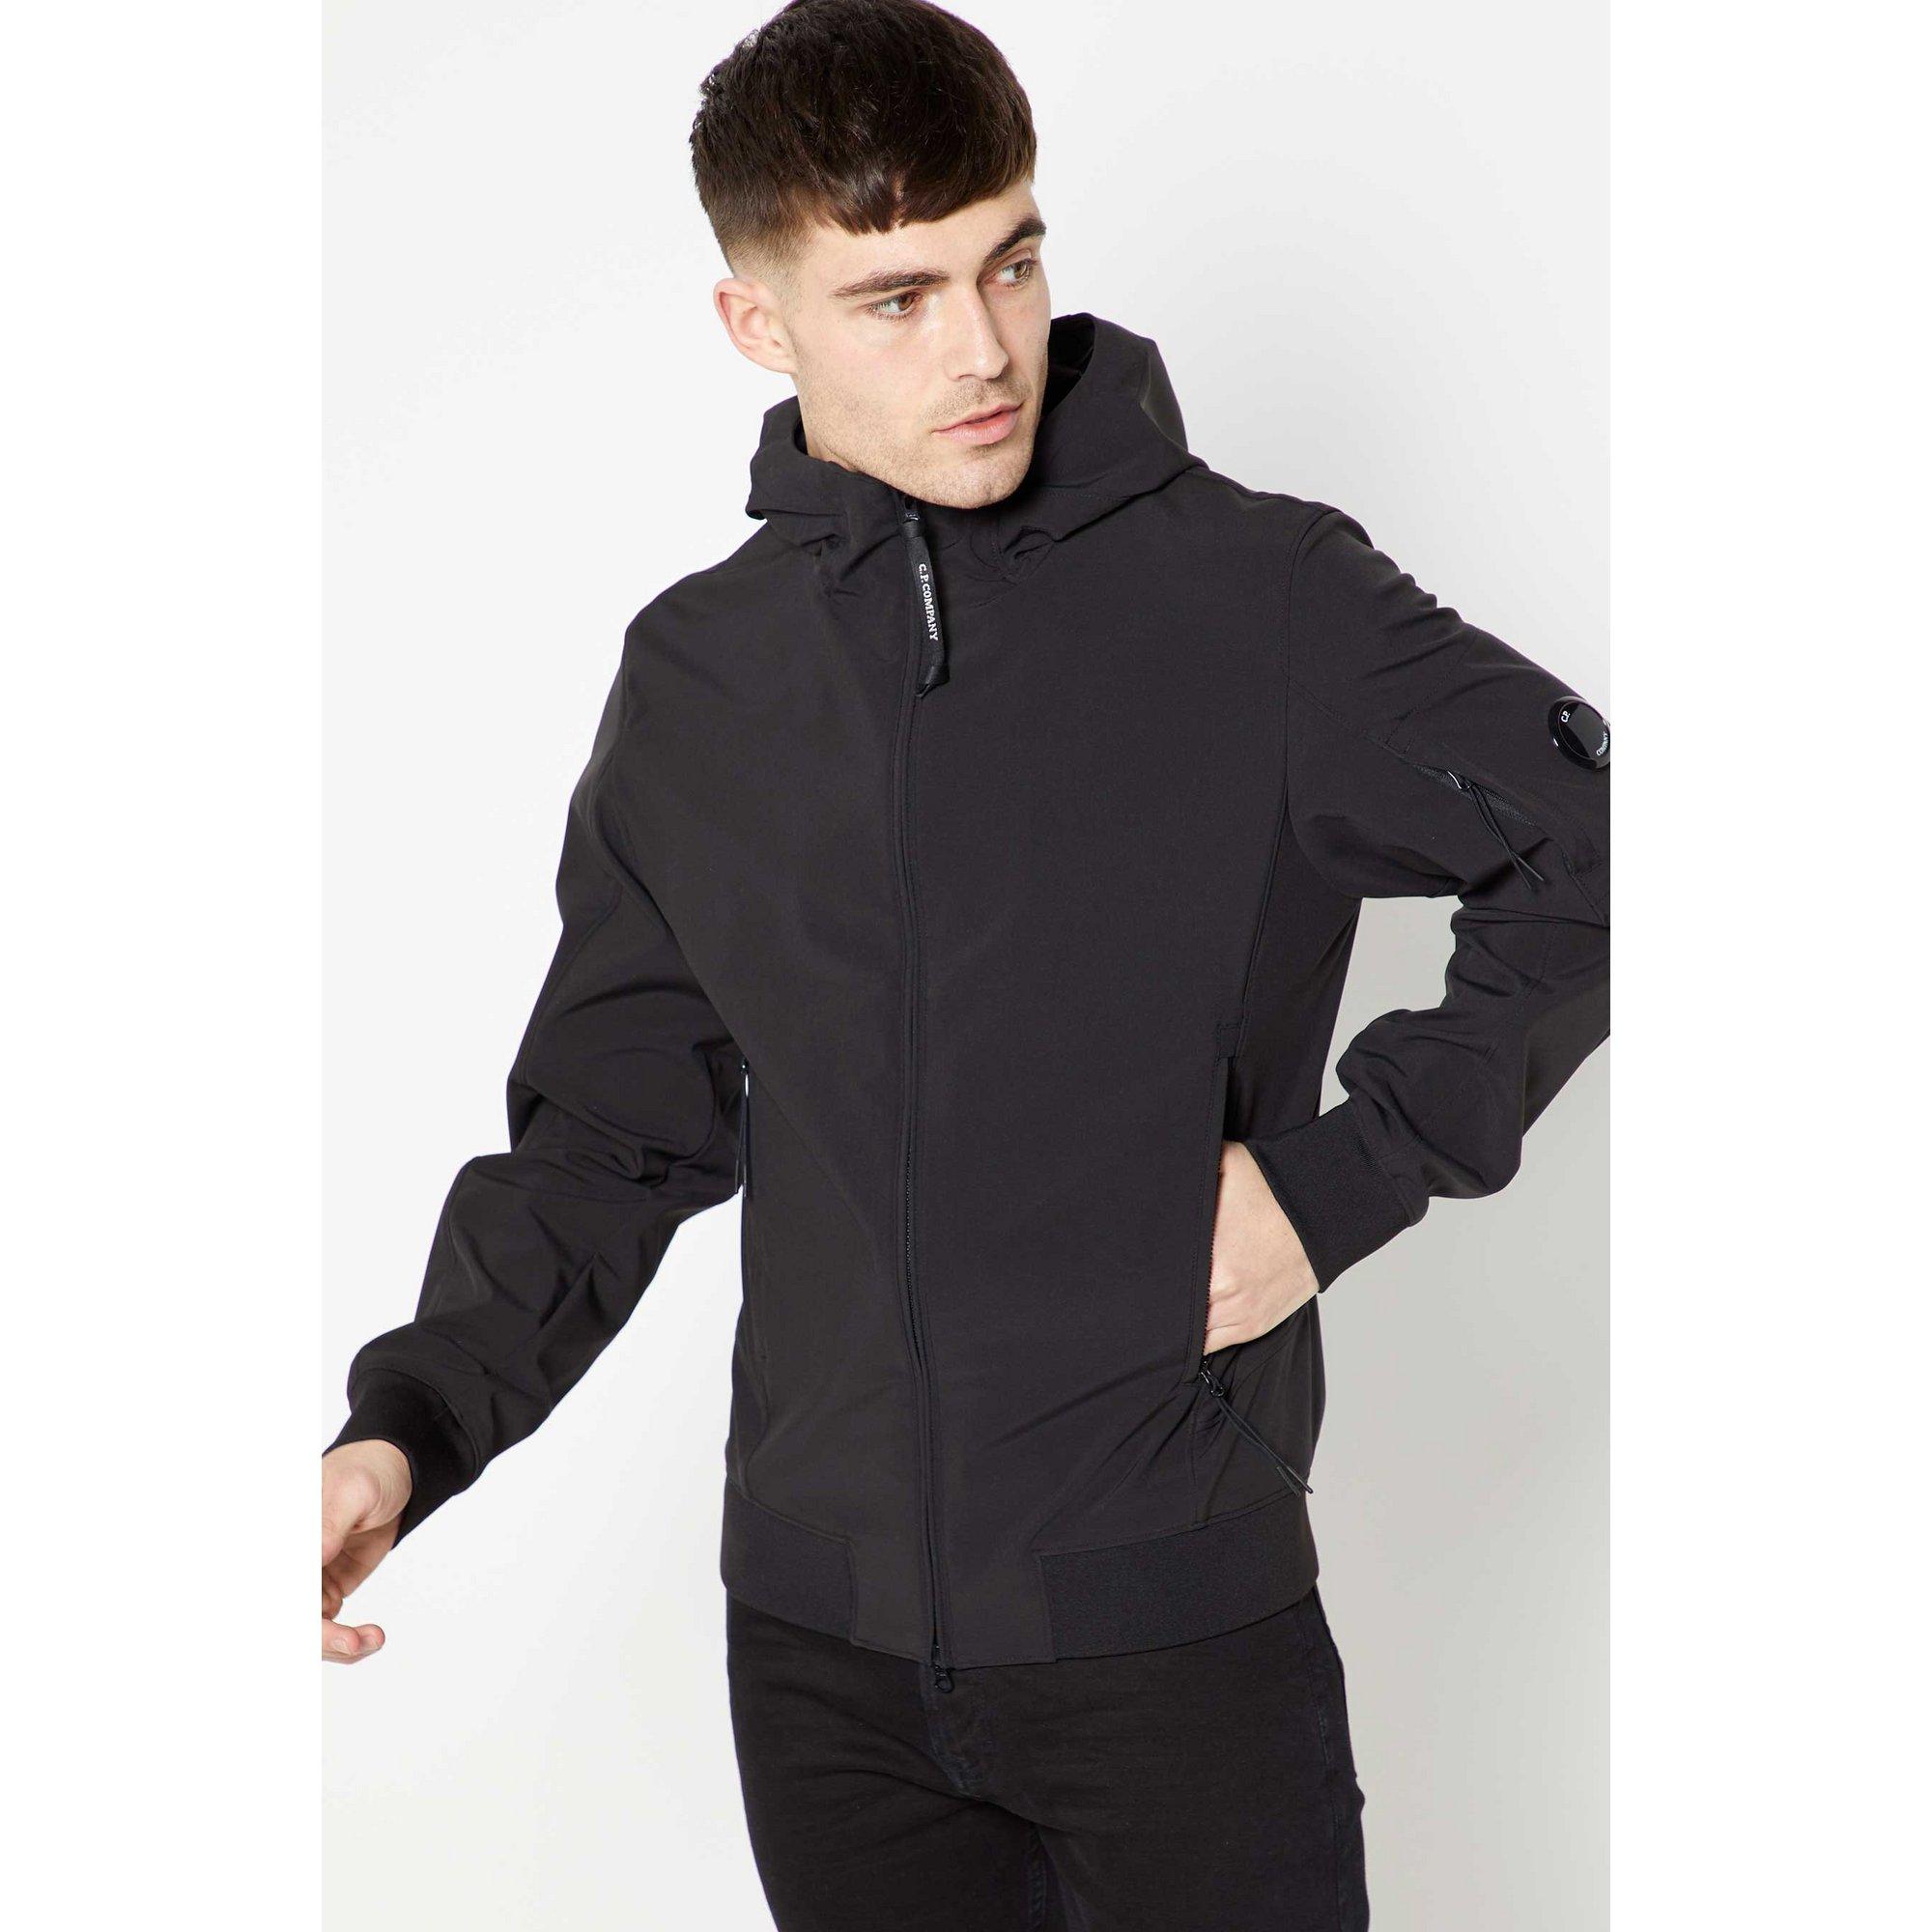 Image of C.P Company Soft Shell Arm Logo Black Jacket